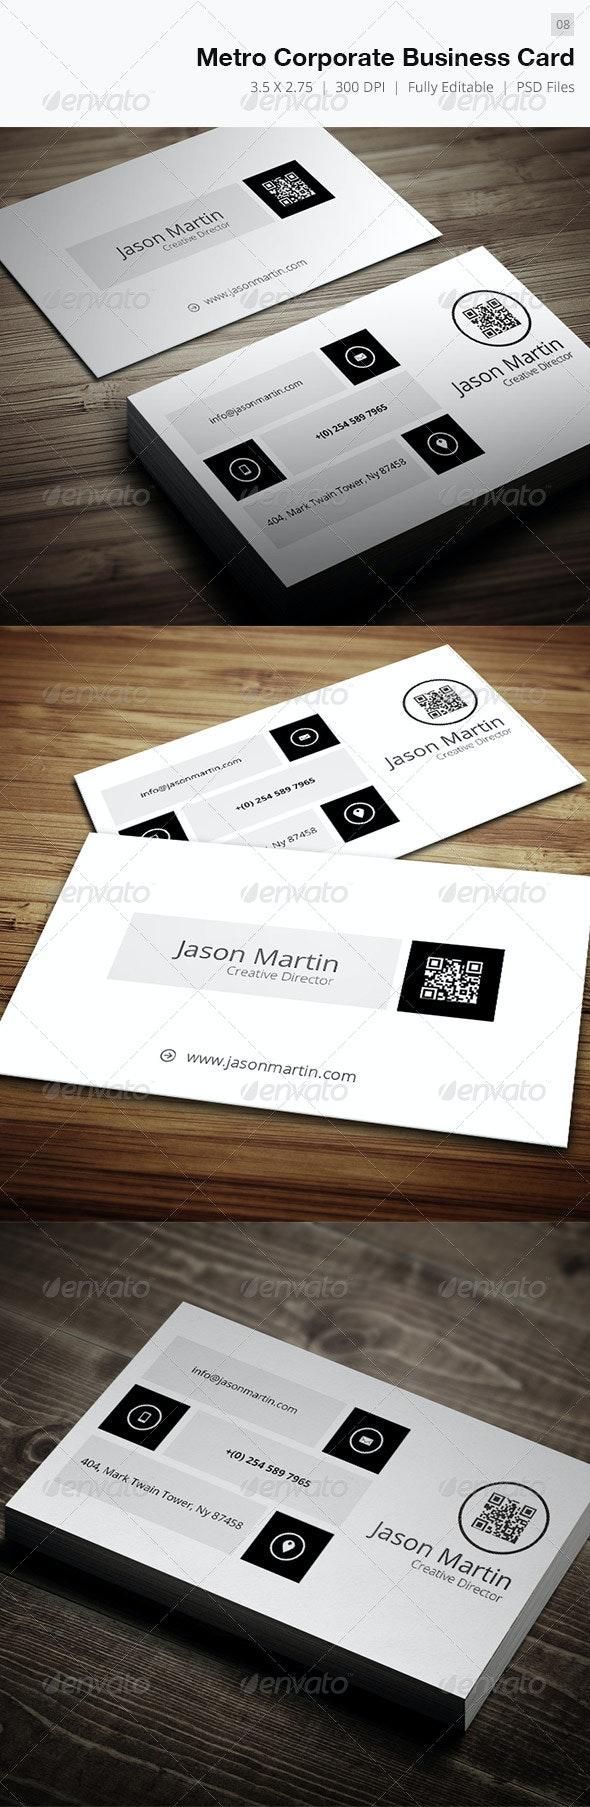 Metro Corporate Business Card - 08 - Corporate Business Cards